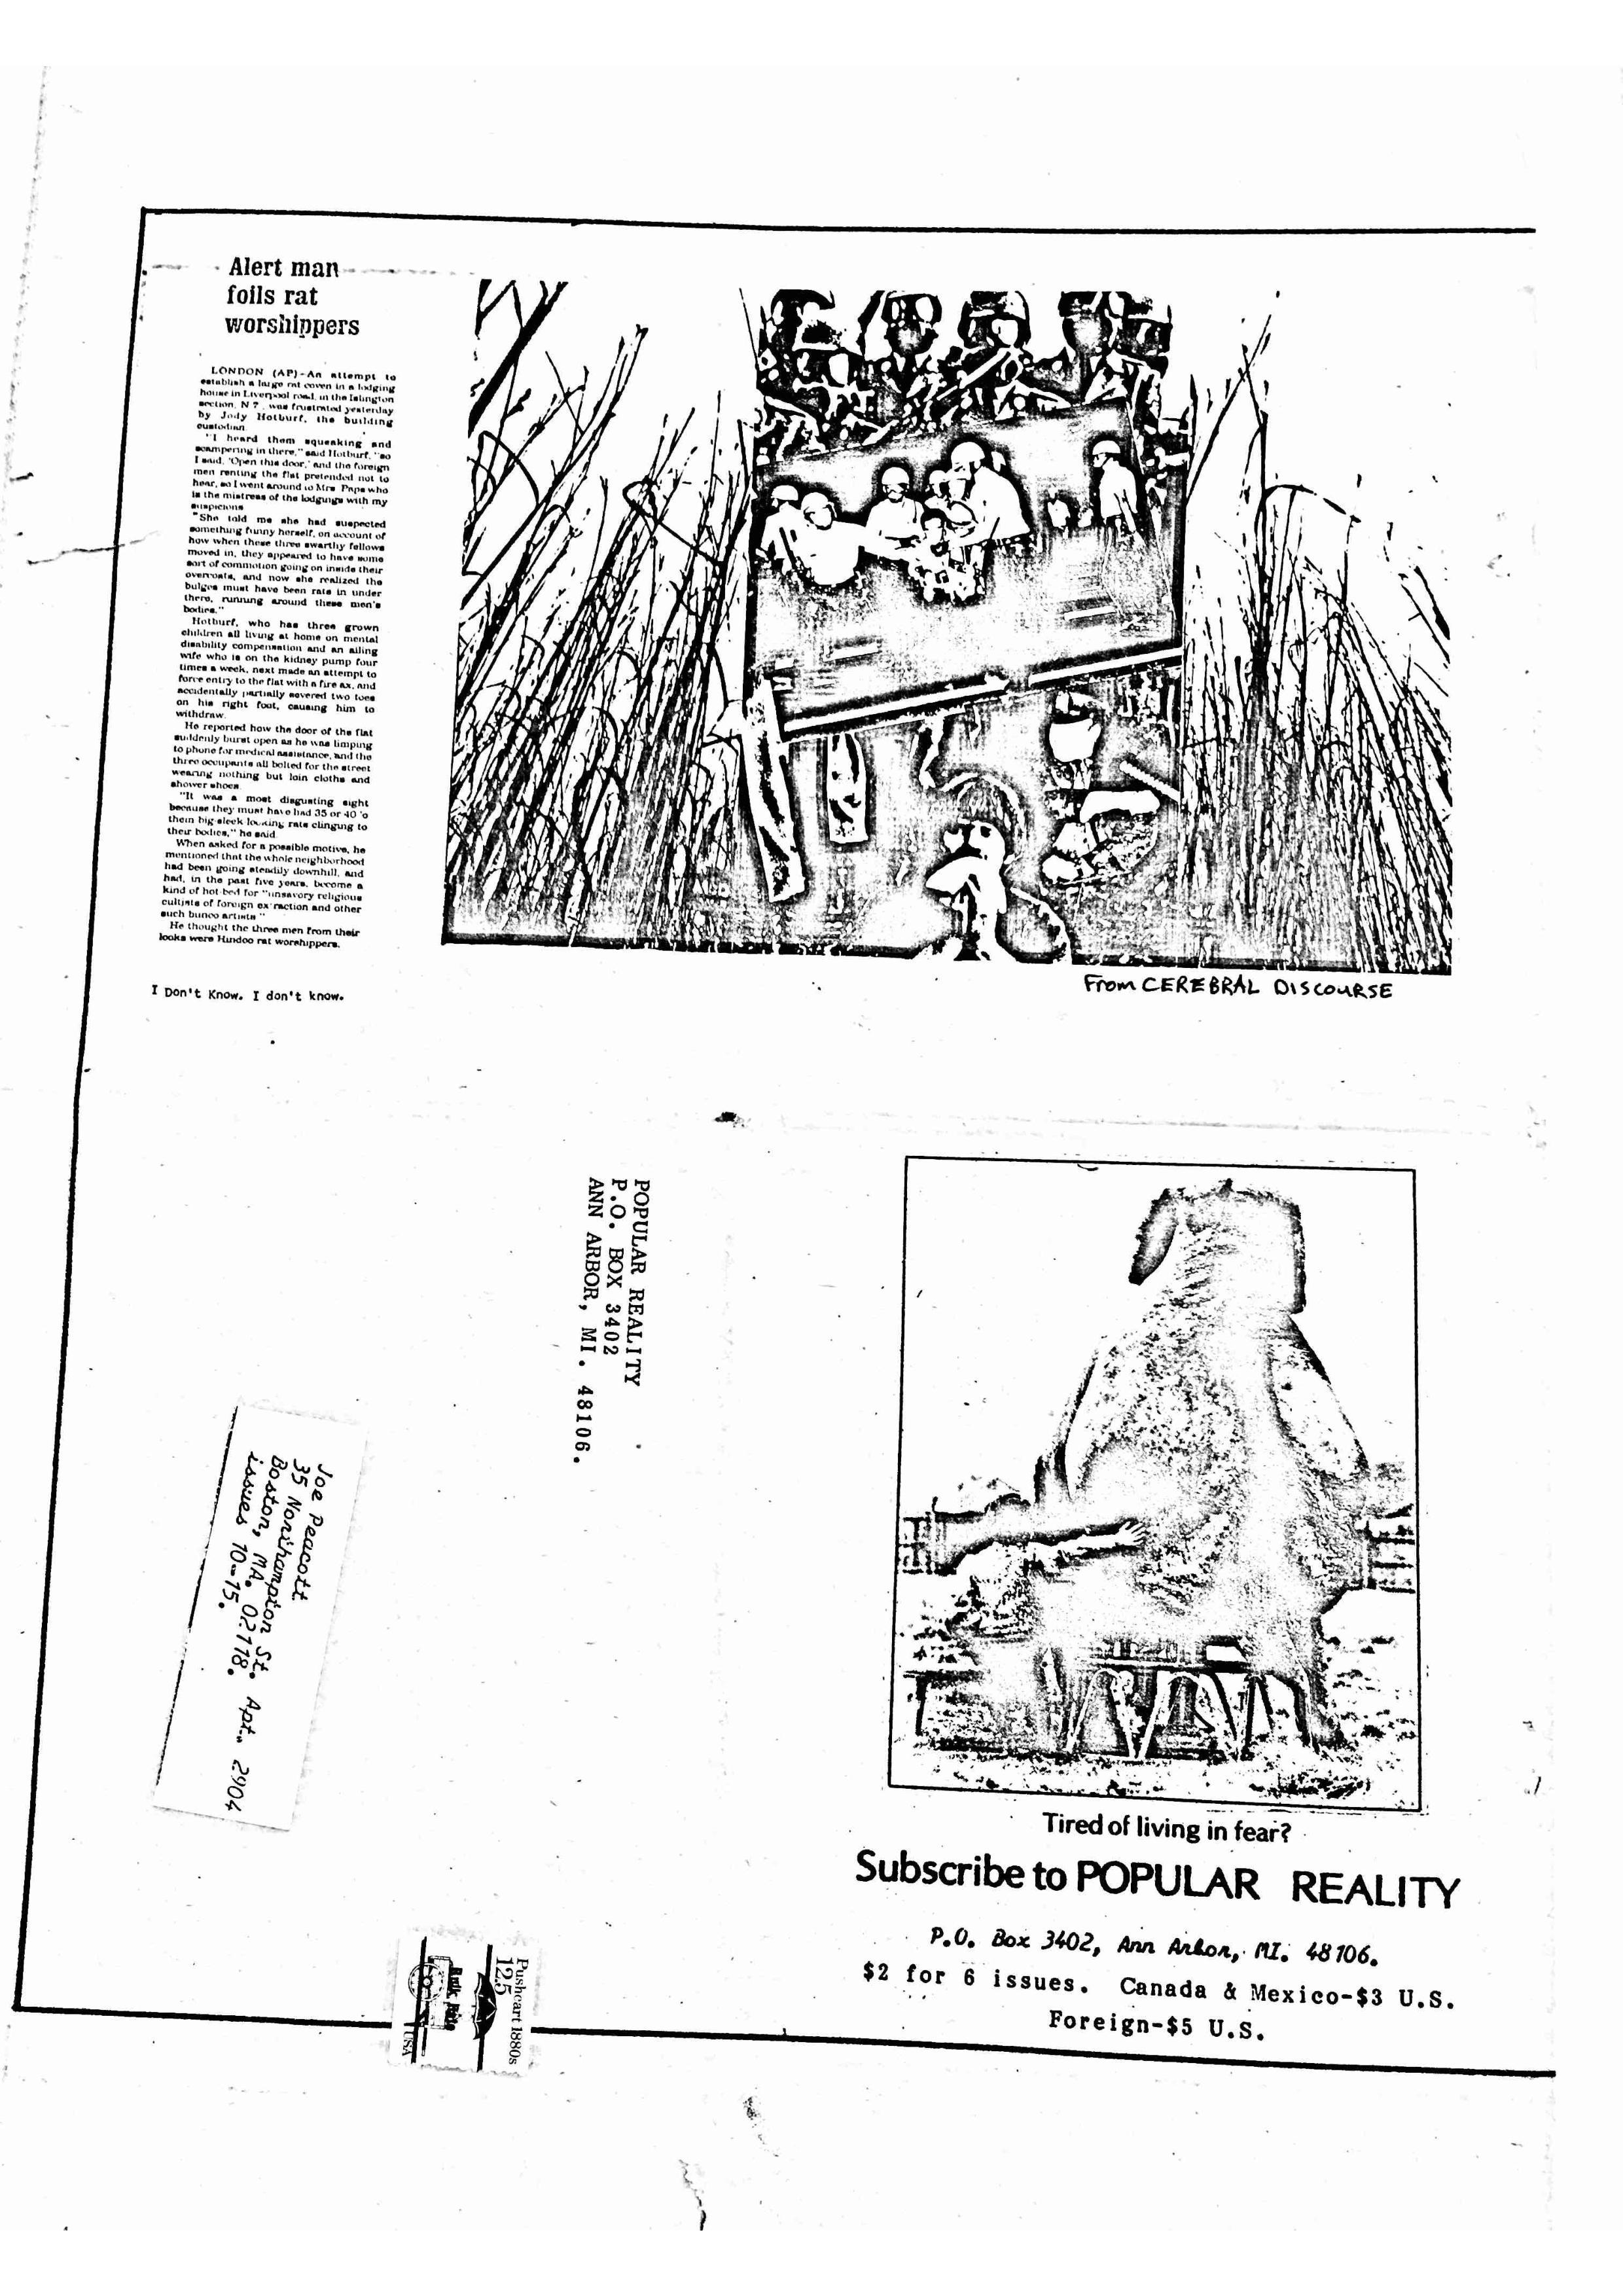 PopRealNo11-page-022.jpg